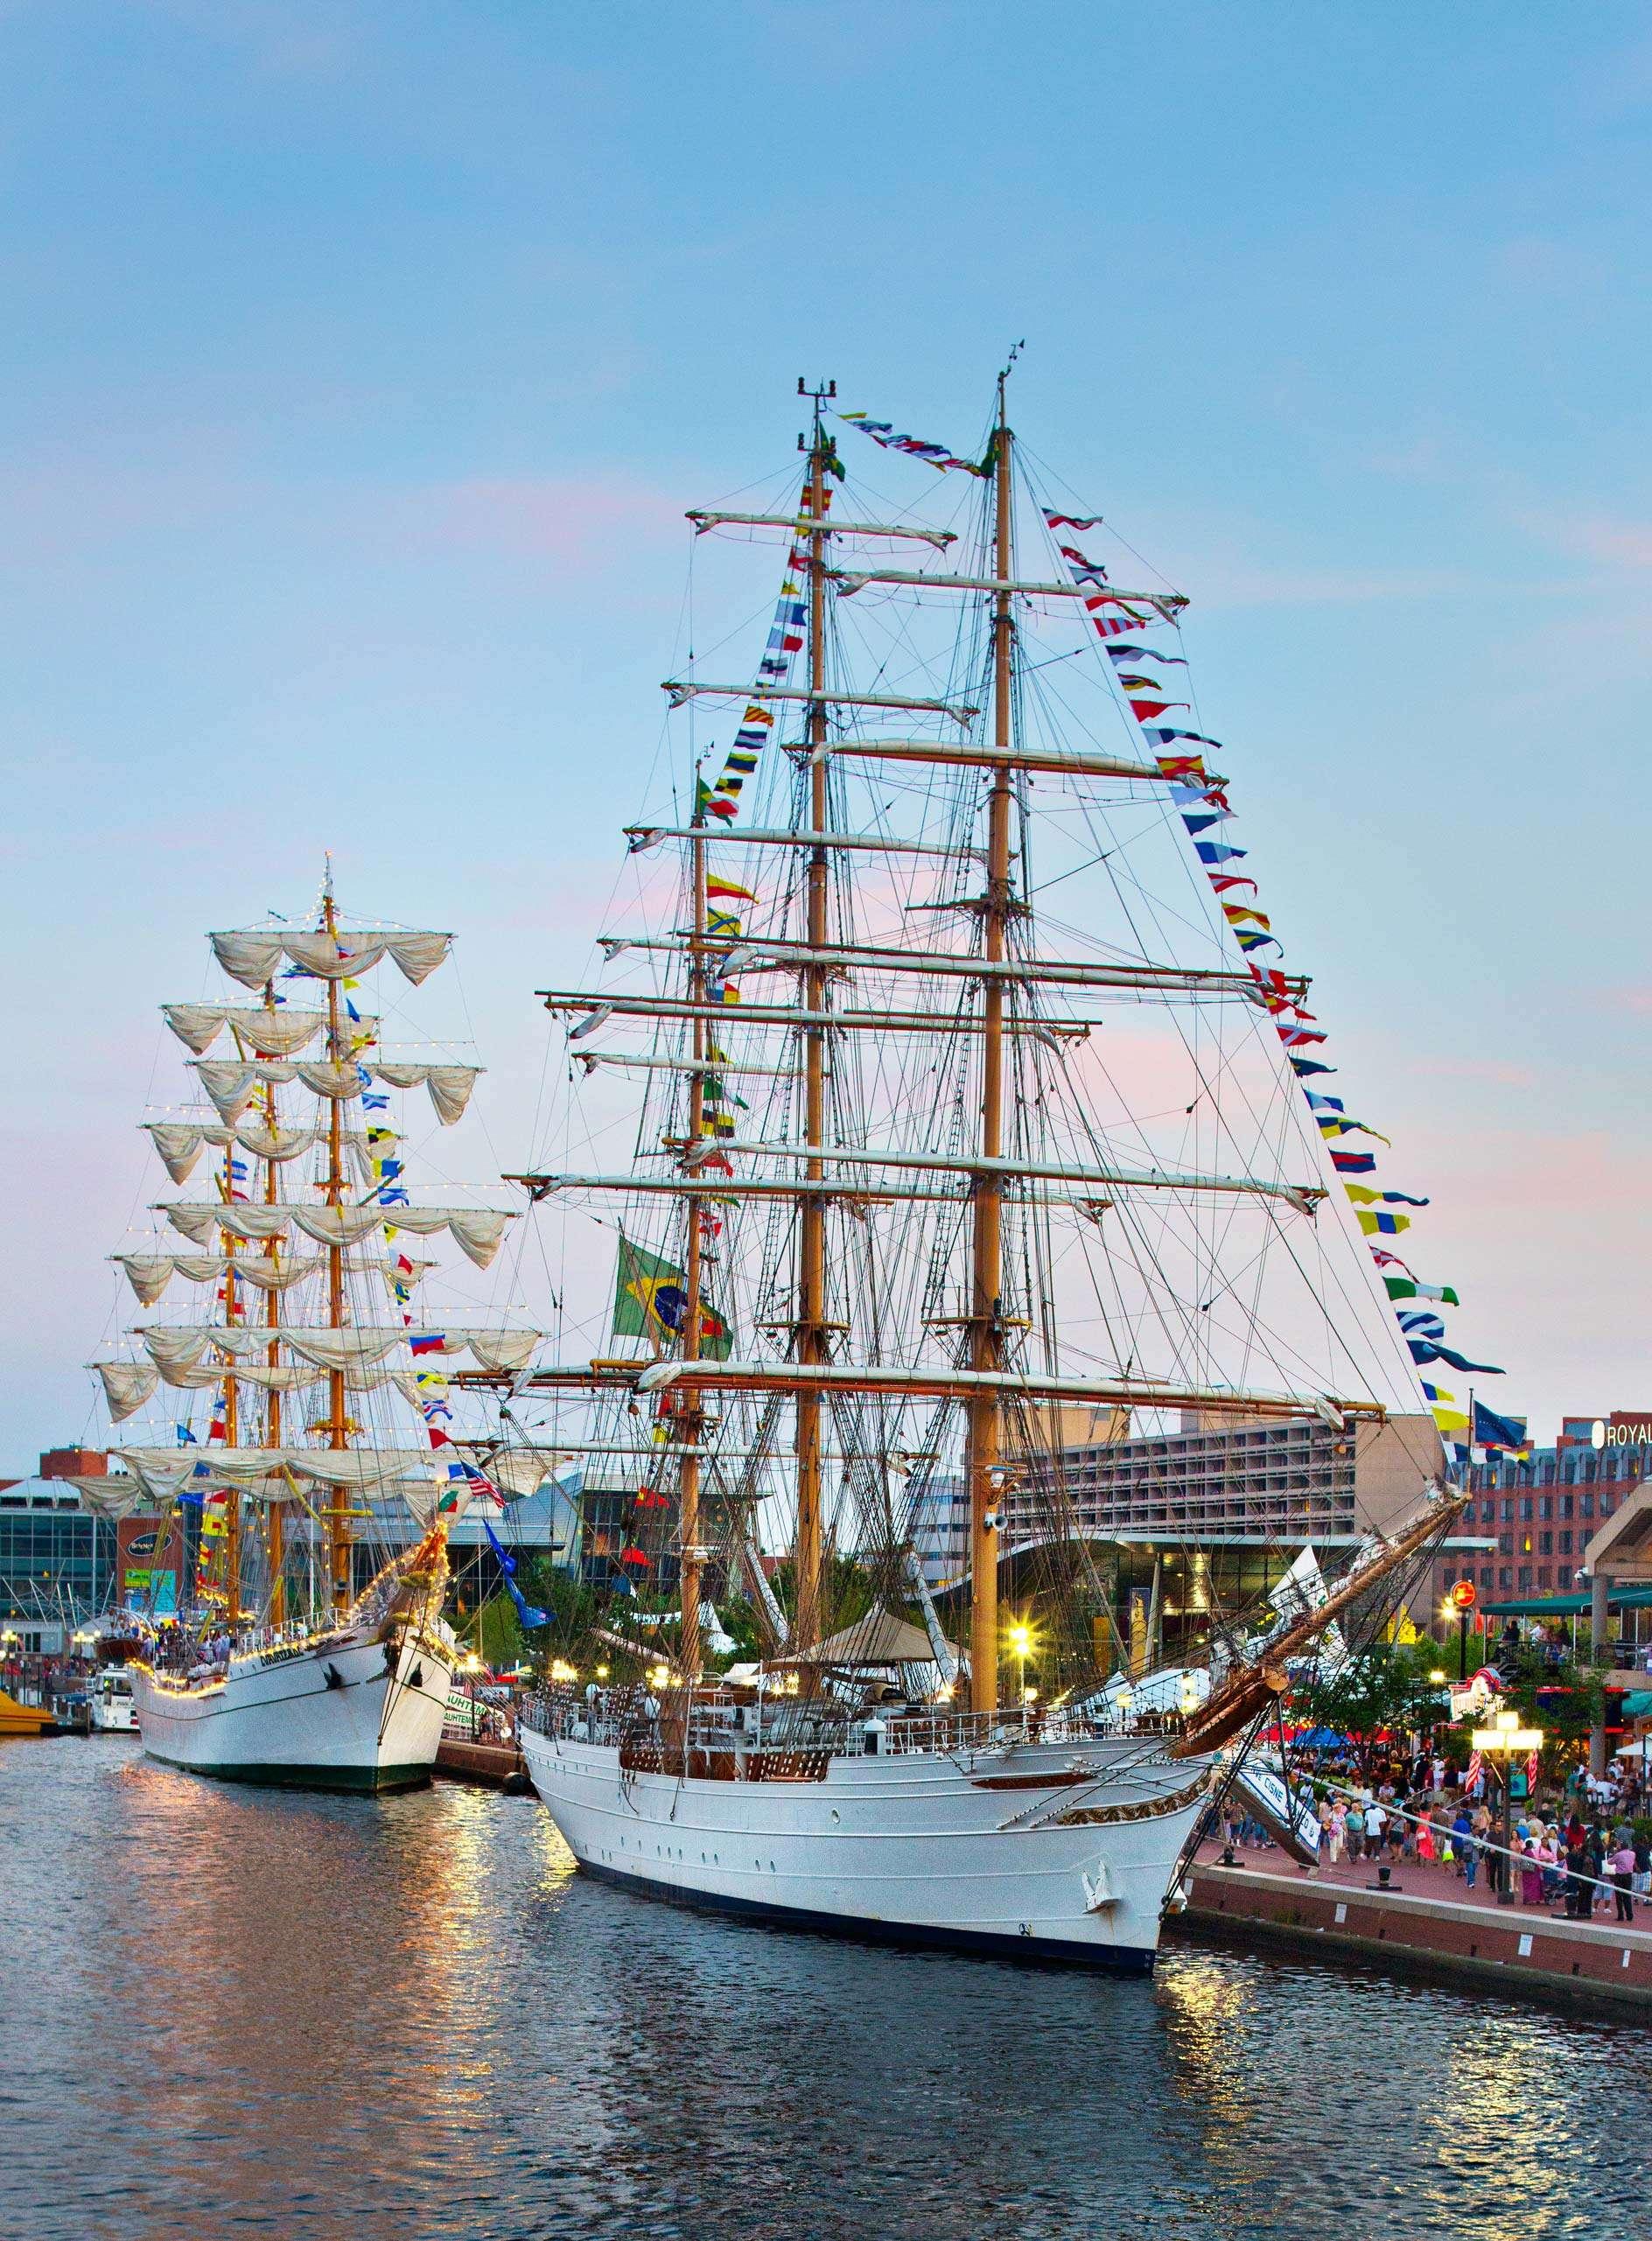 PORTFOLIO - Baltimore - Attractions  #14